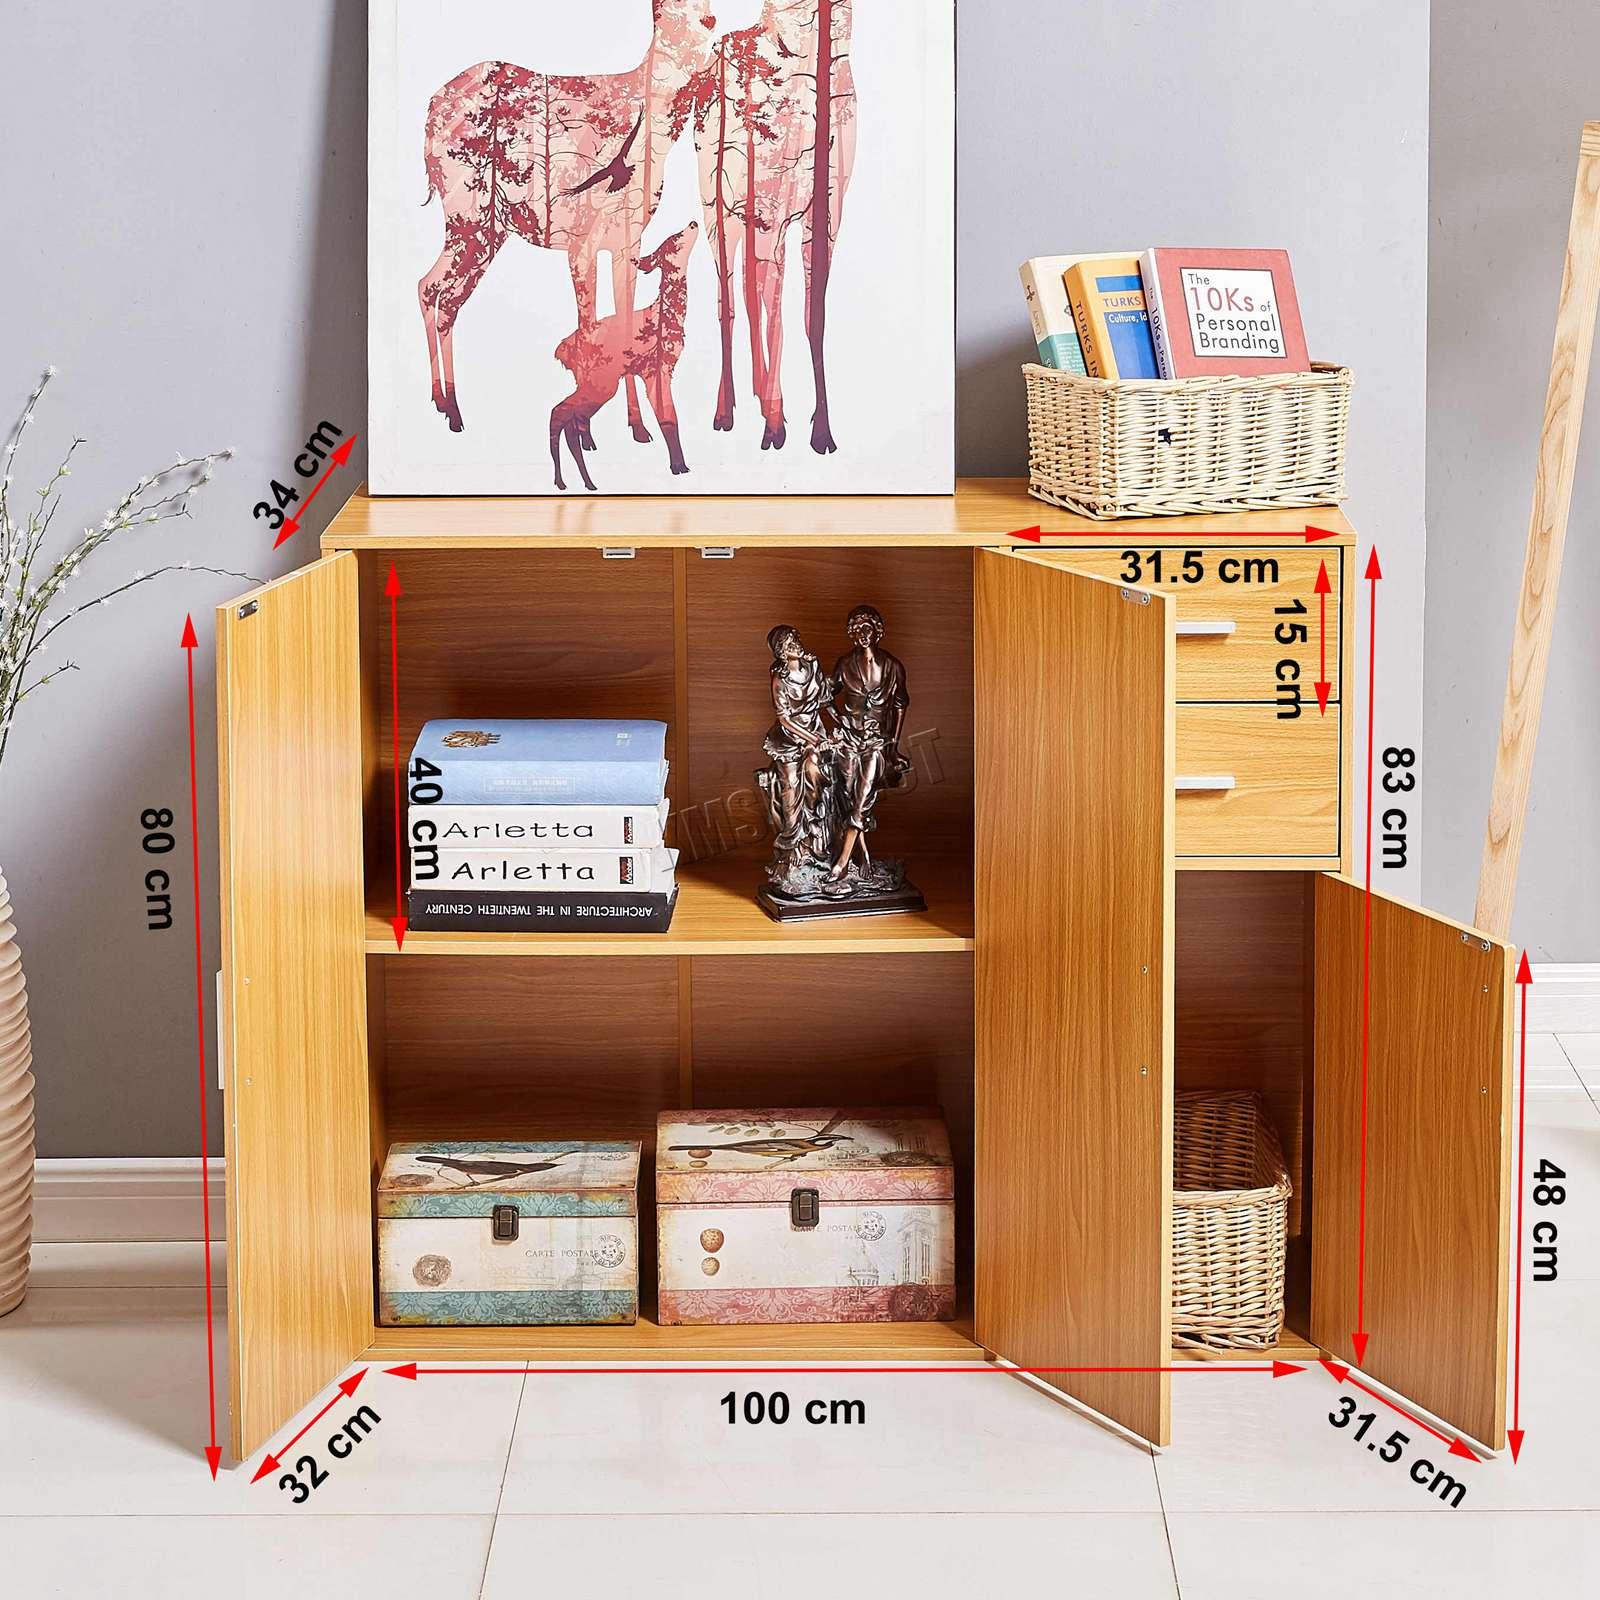 WestWood-Sideboard-Cabinet-Storage-tableware-Kitchen-Cupboard-Unit-PB-SSP01-NEW thumbnail 21